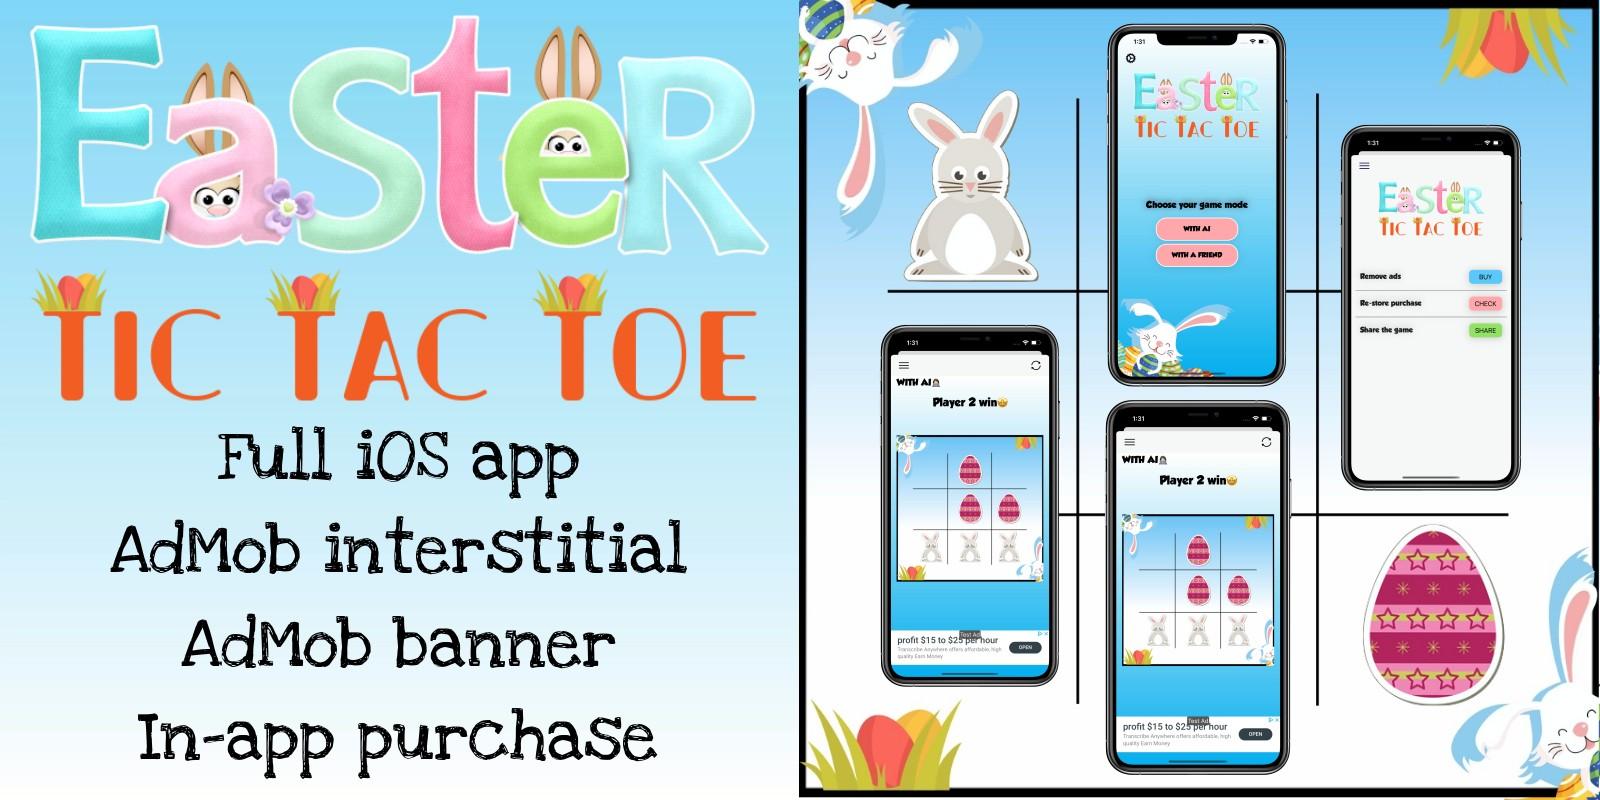 Easter Tic Tac Toe - Full iOS Application